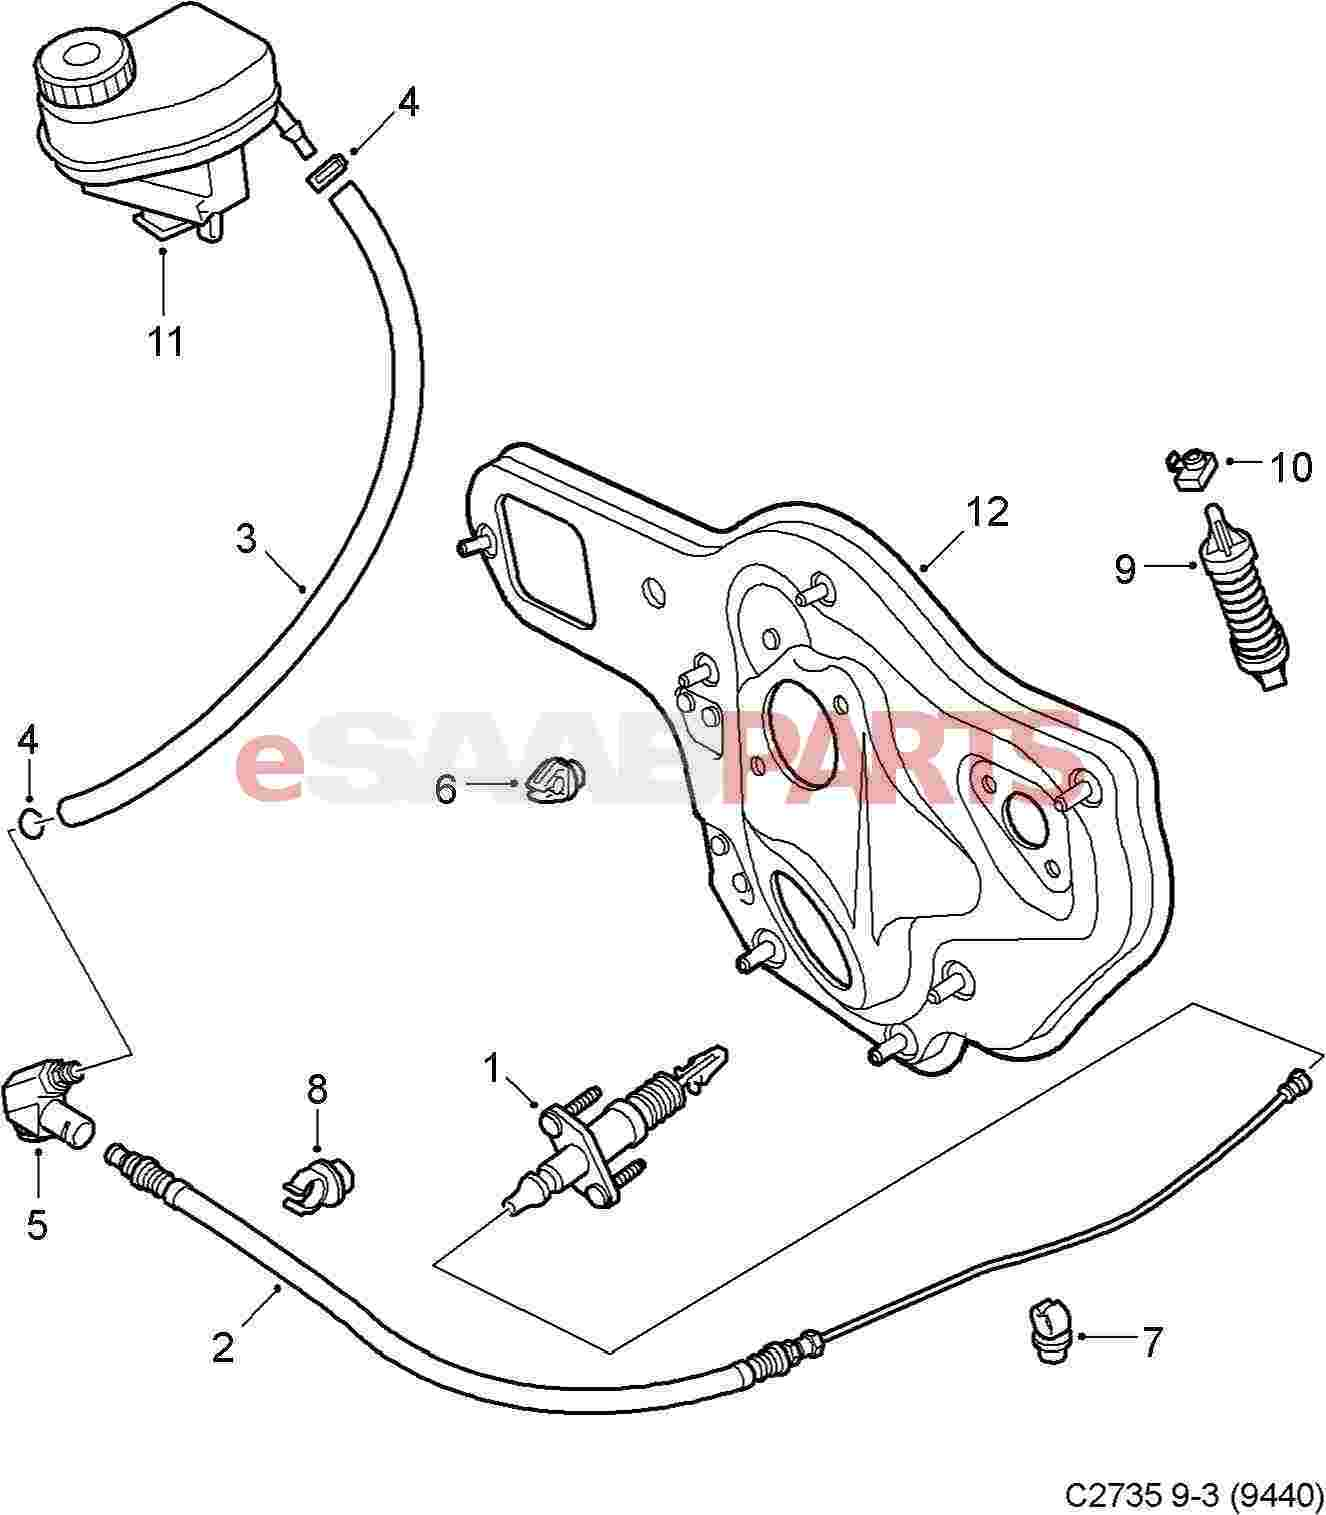 Parts.com® | Saab 9-3 Steering Gear - Linkage OEM PARTS